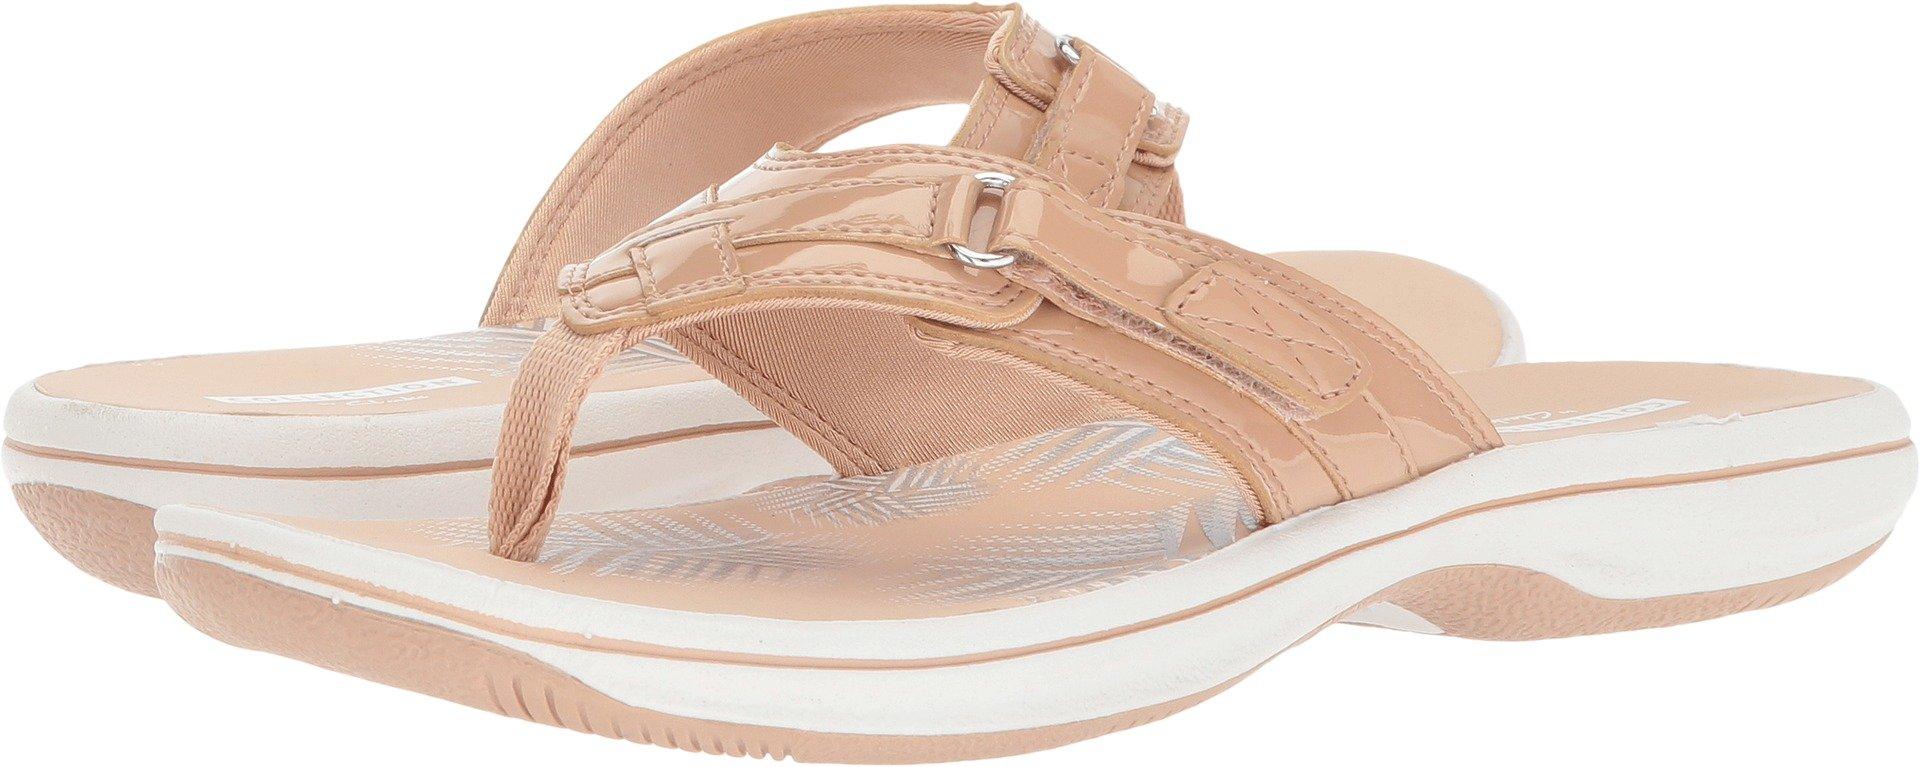 CLARKS Women's Breeze SEA Platform, Nude Synthetic Patent, 5 B(M) US